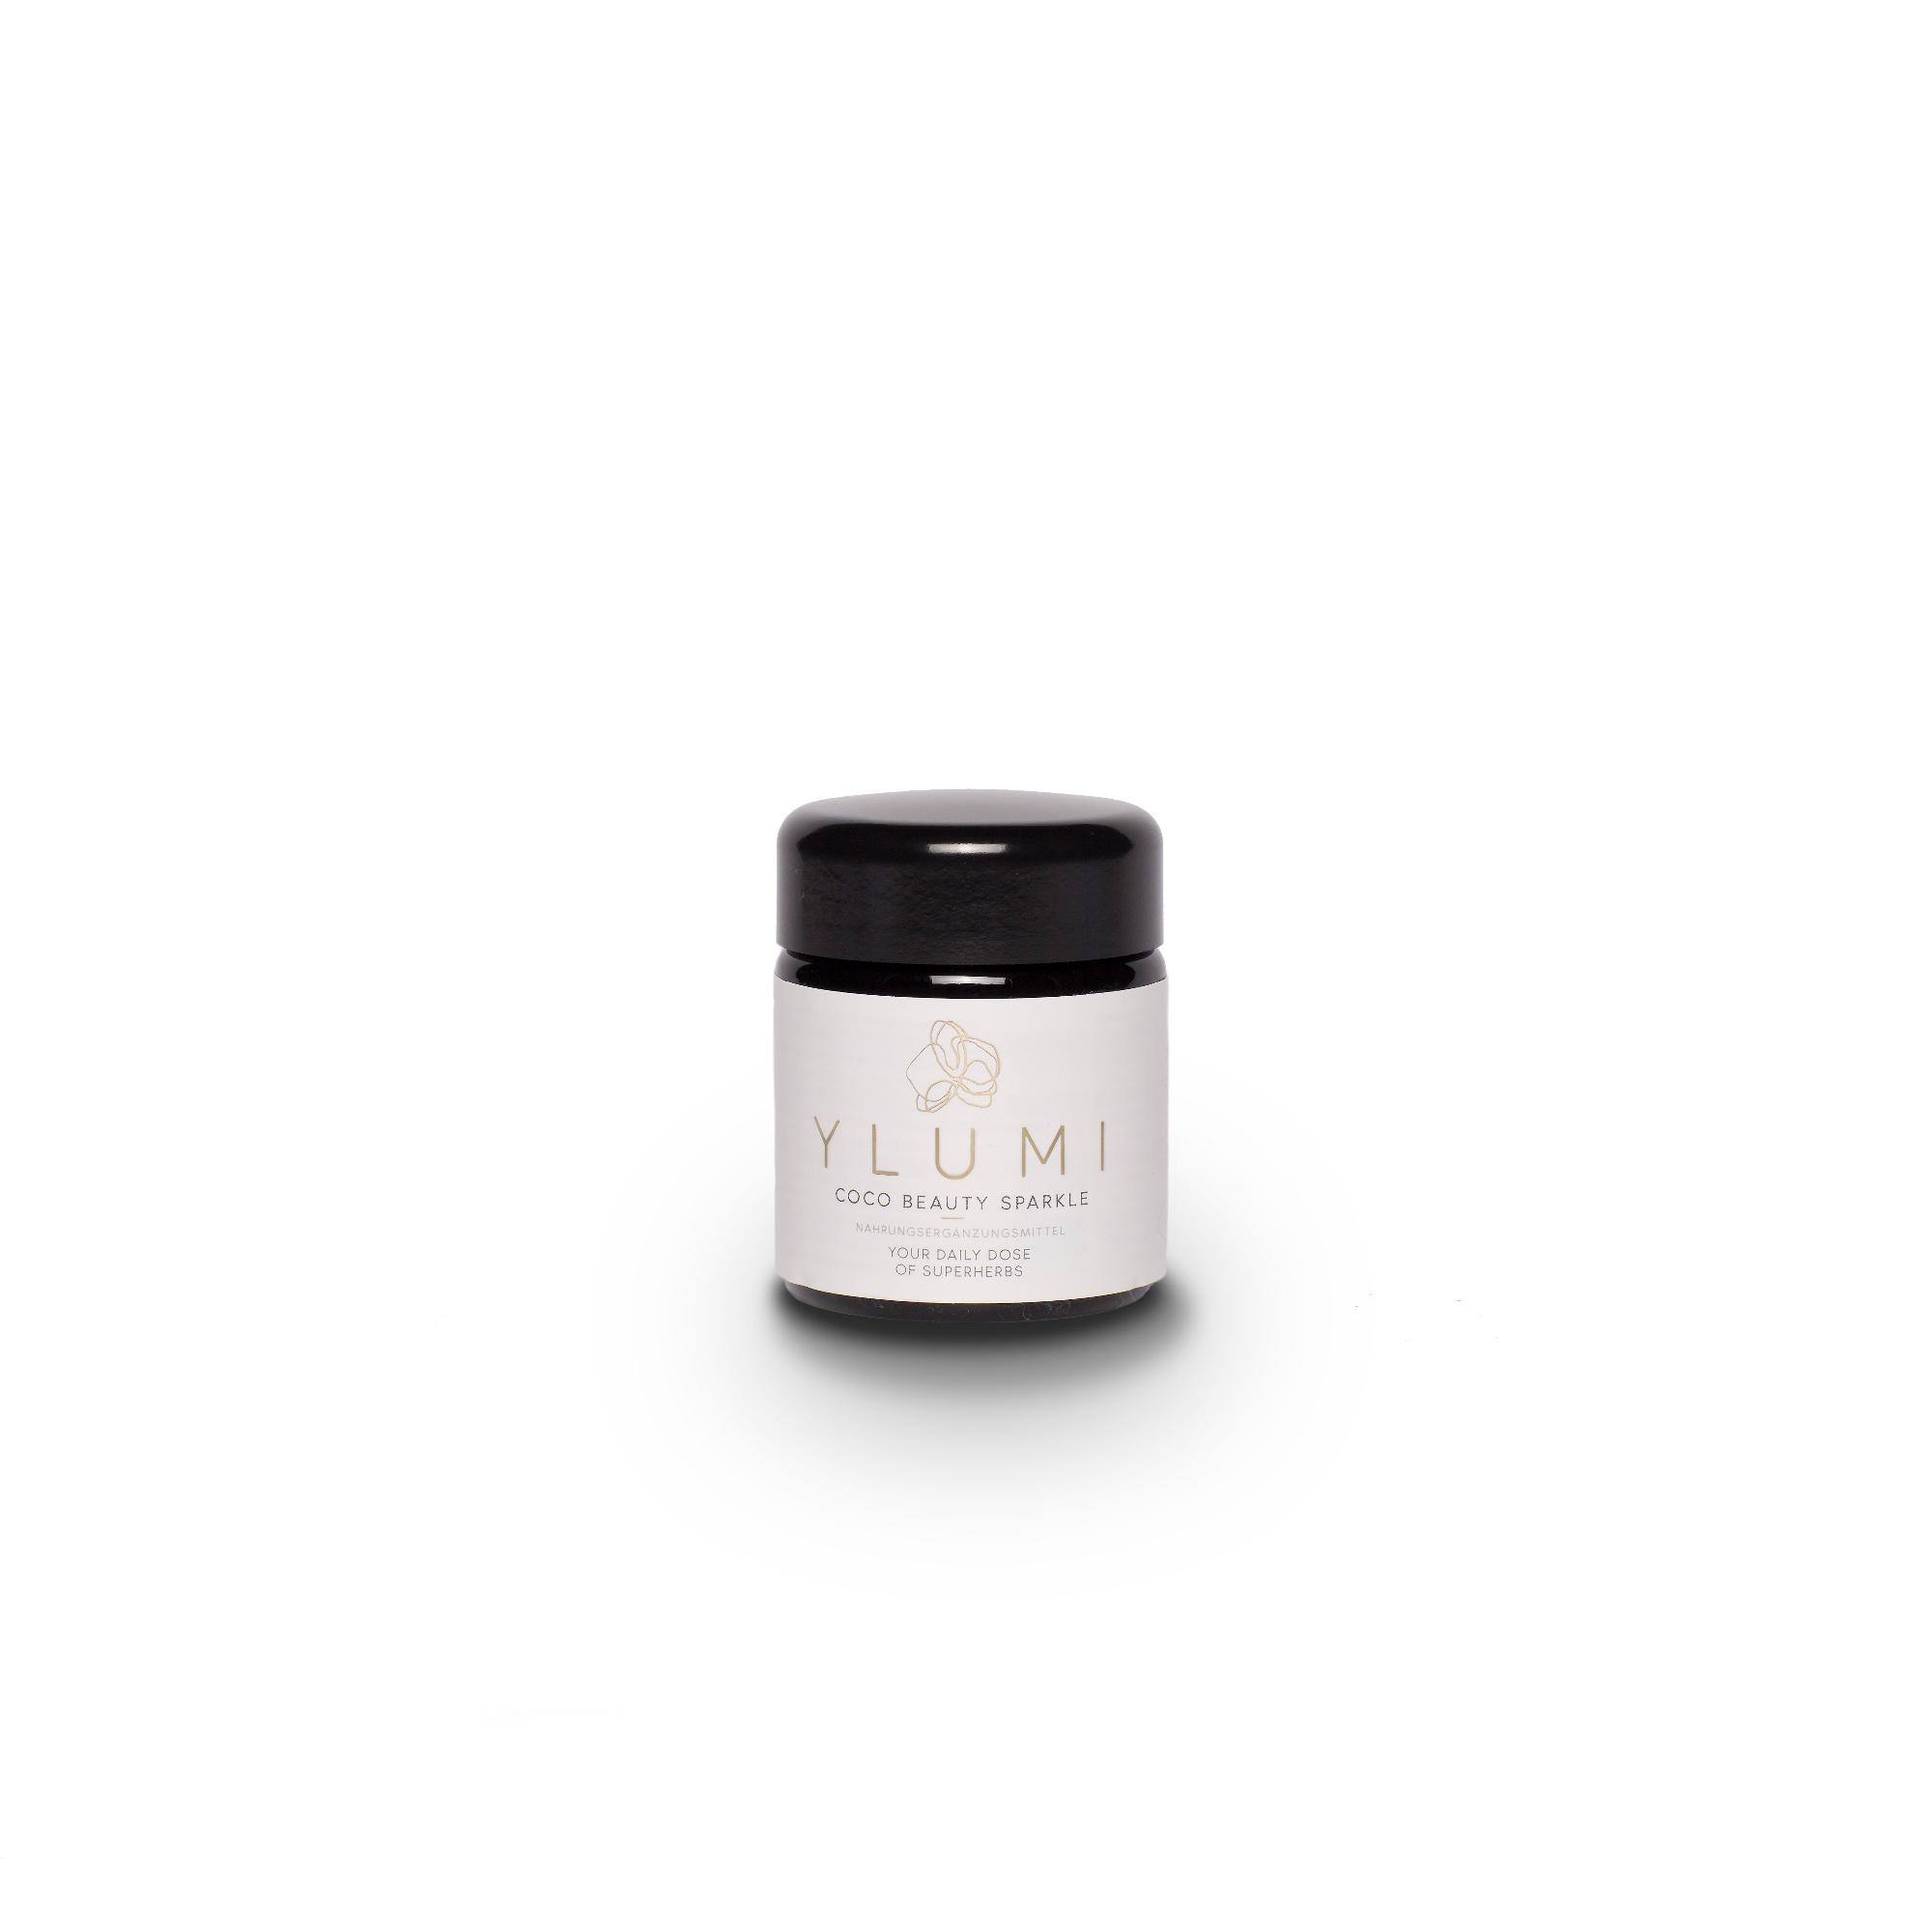 YLUMI Pulver Coco Beauty Sparkle 25 g 845039